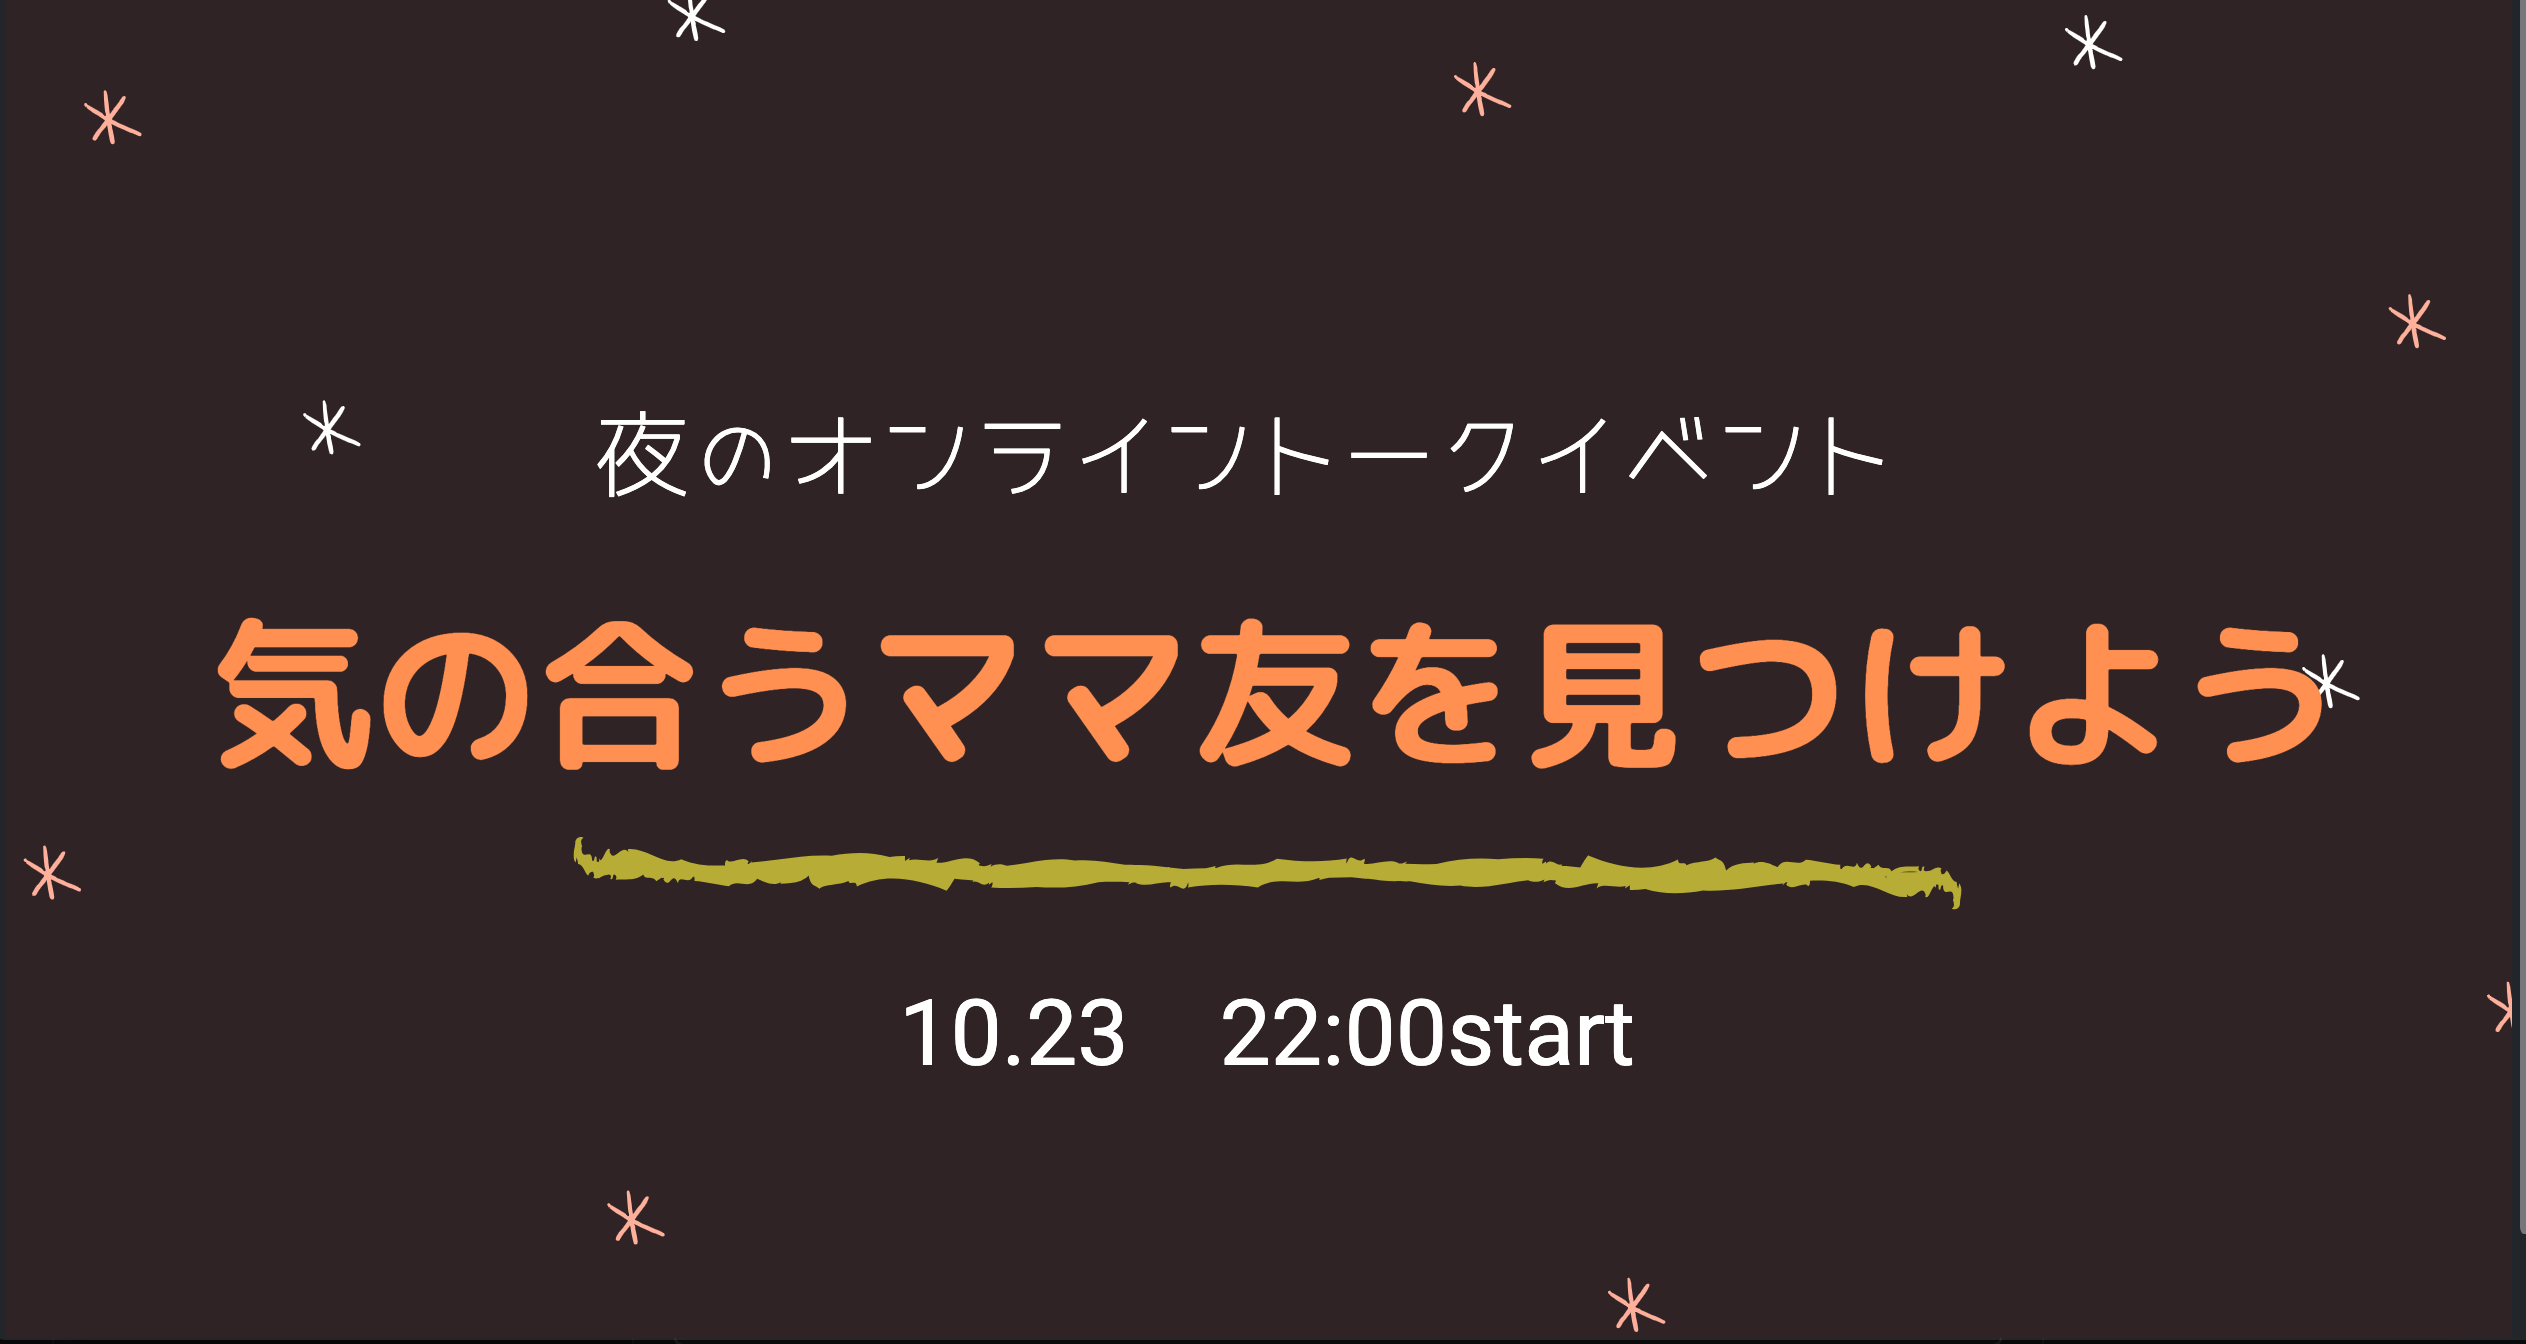 Fiikaオンラインイベントのお知らせ